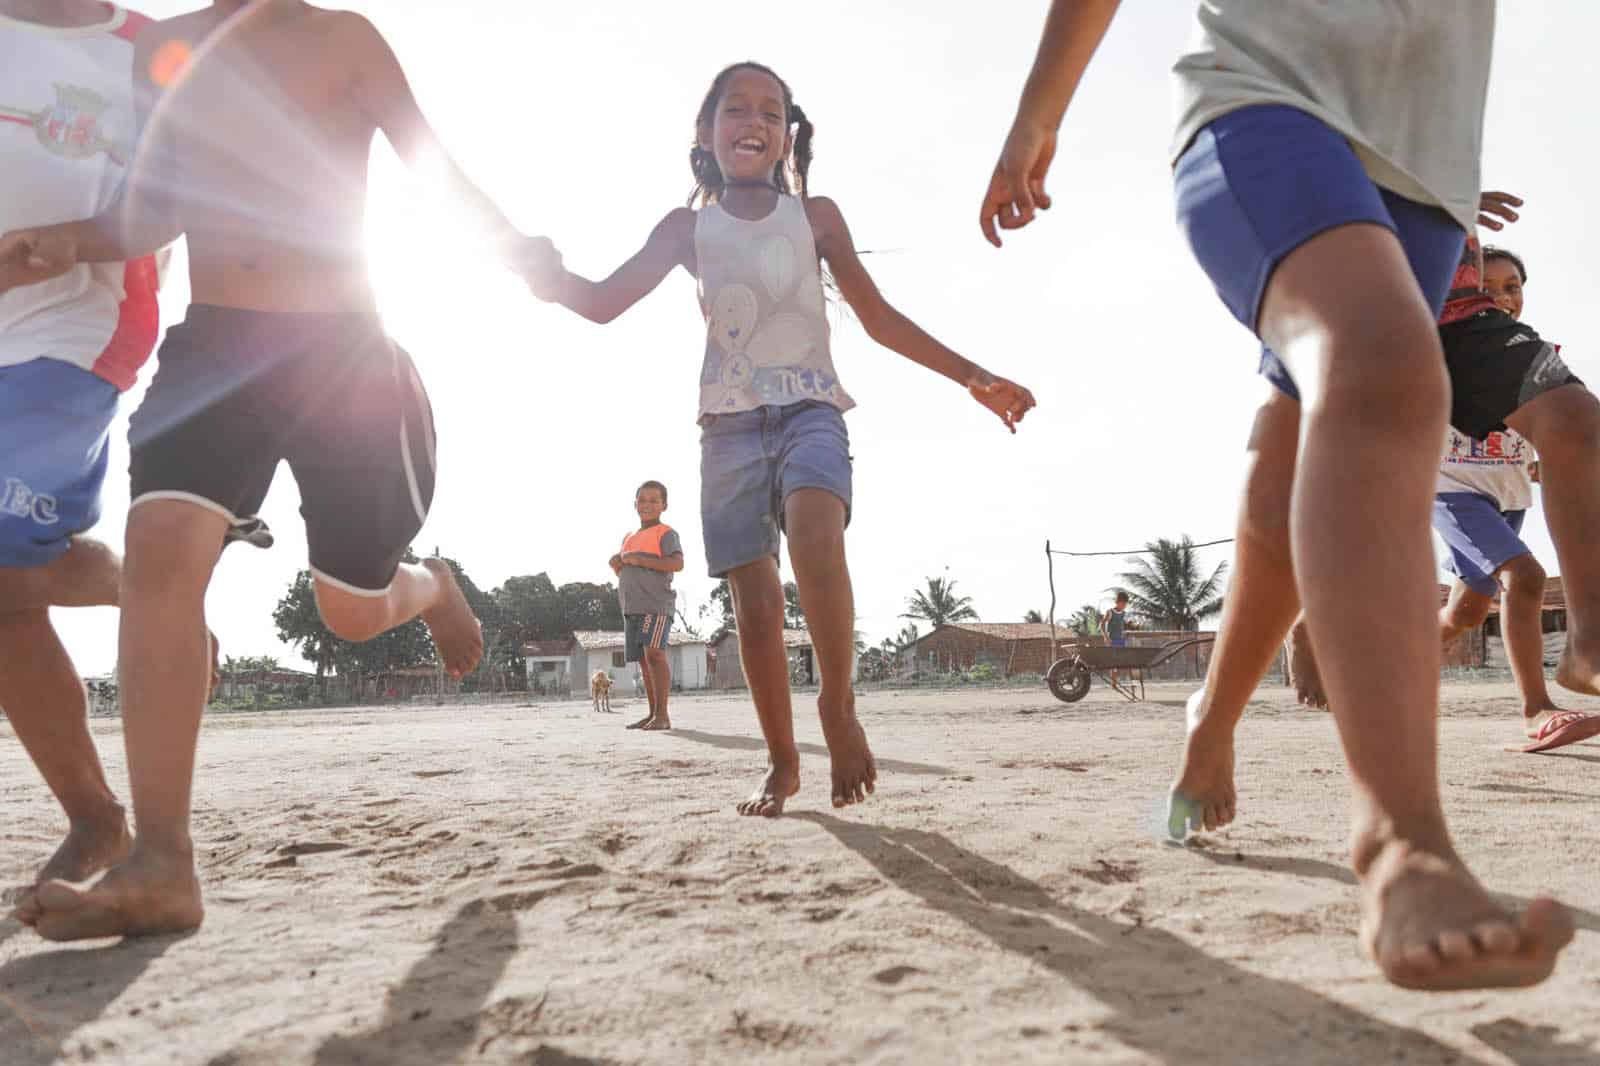 Klebiane running on sand with other children